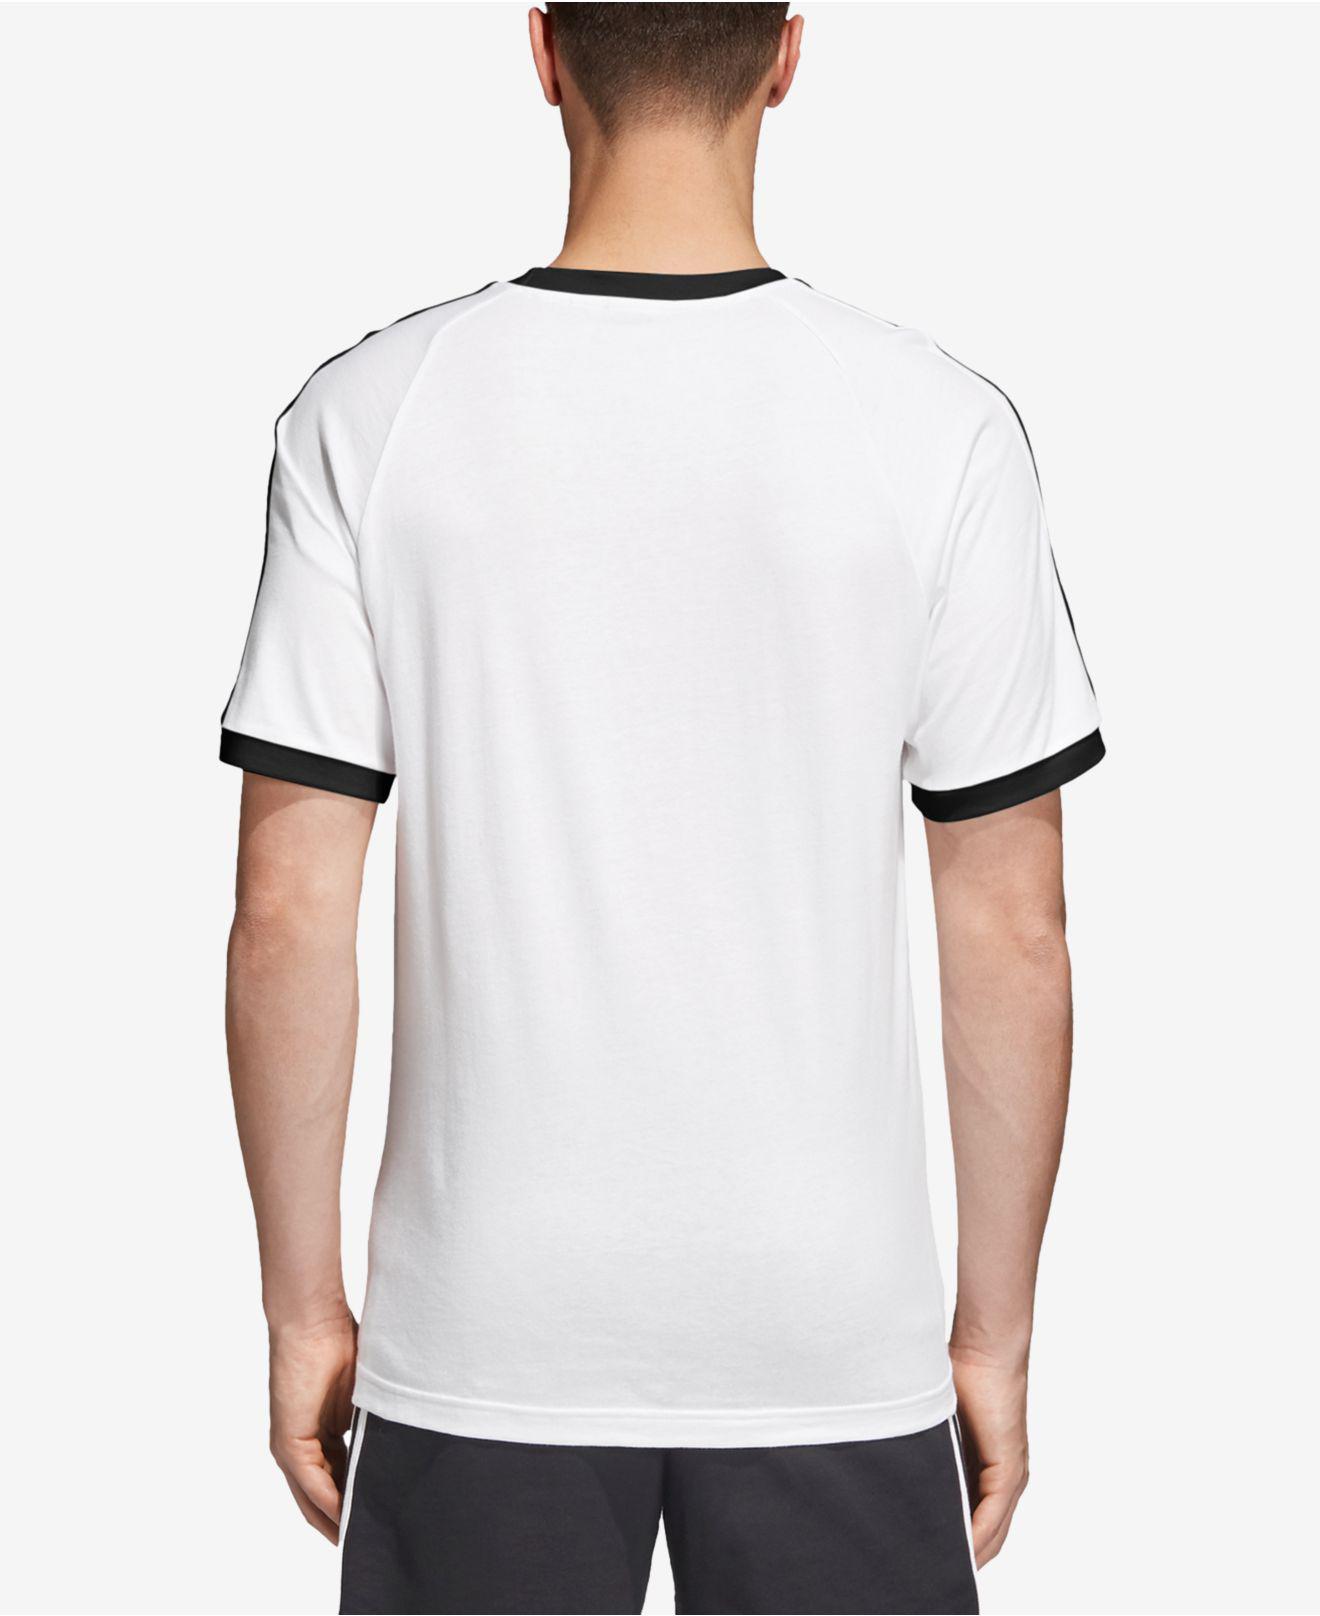 dea694ff3 Lyst - adidas California 3-stripes T-shirt in White for Men - Save 26%